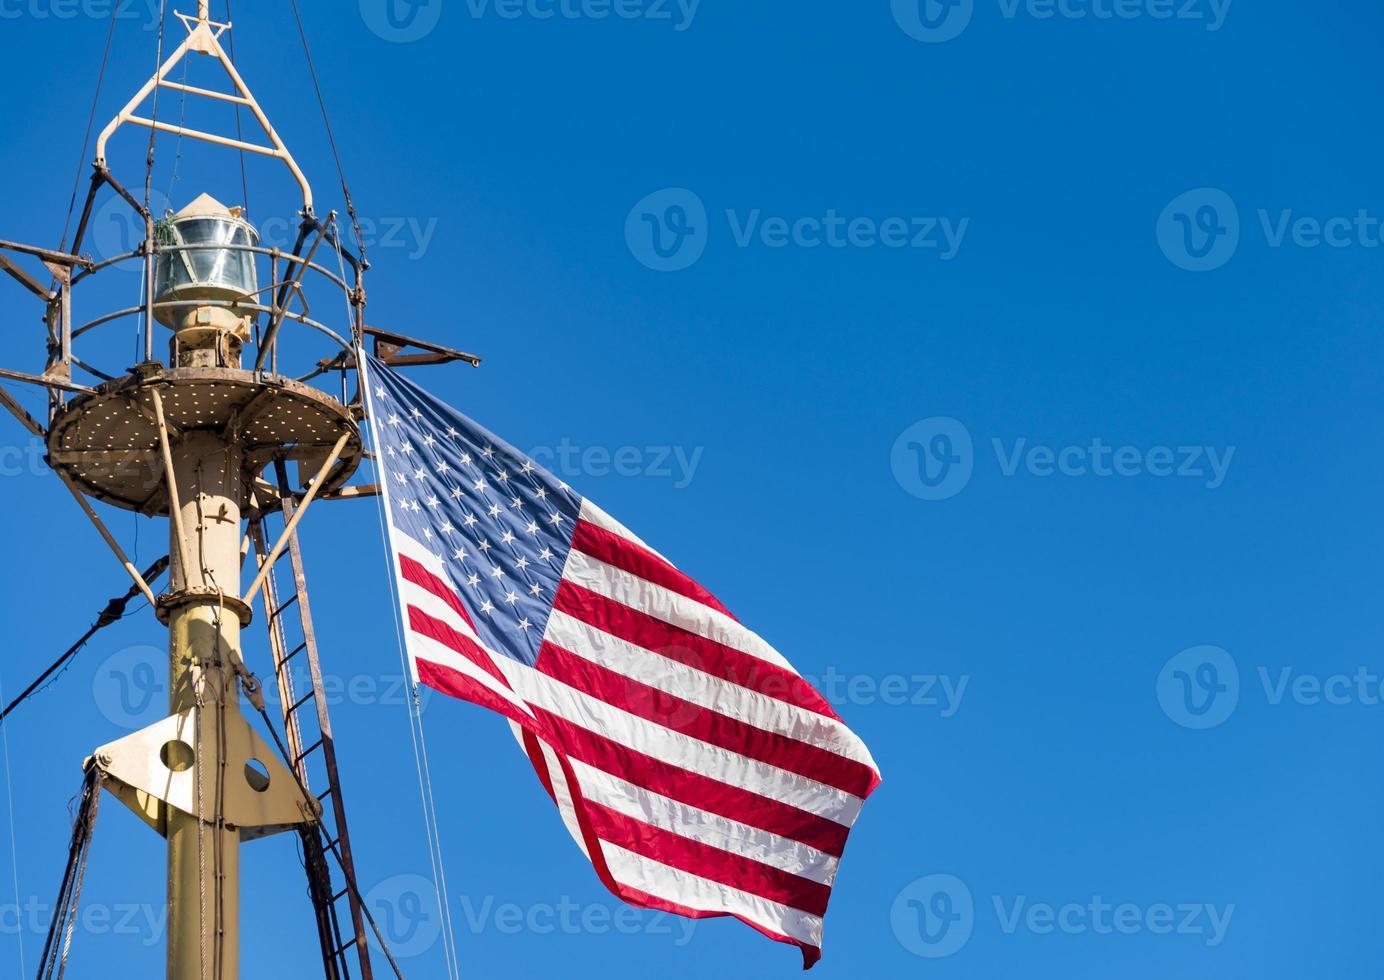 Amerikas förenta staters flagga i fartygsmast foto